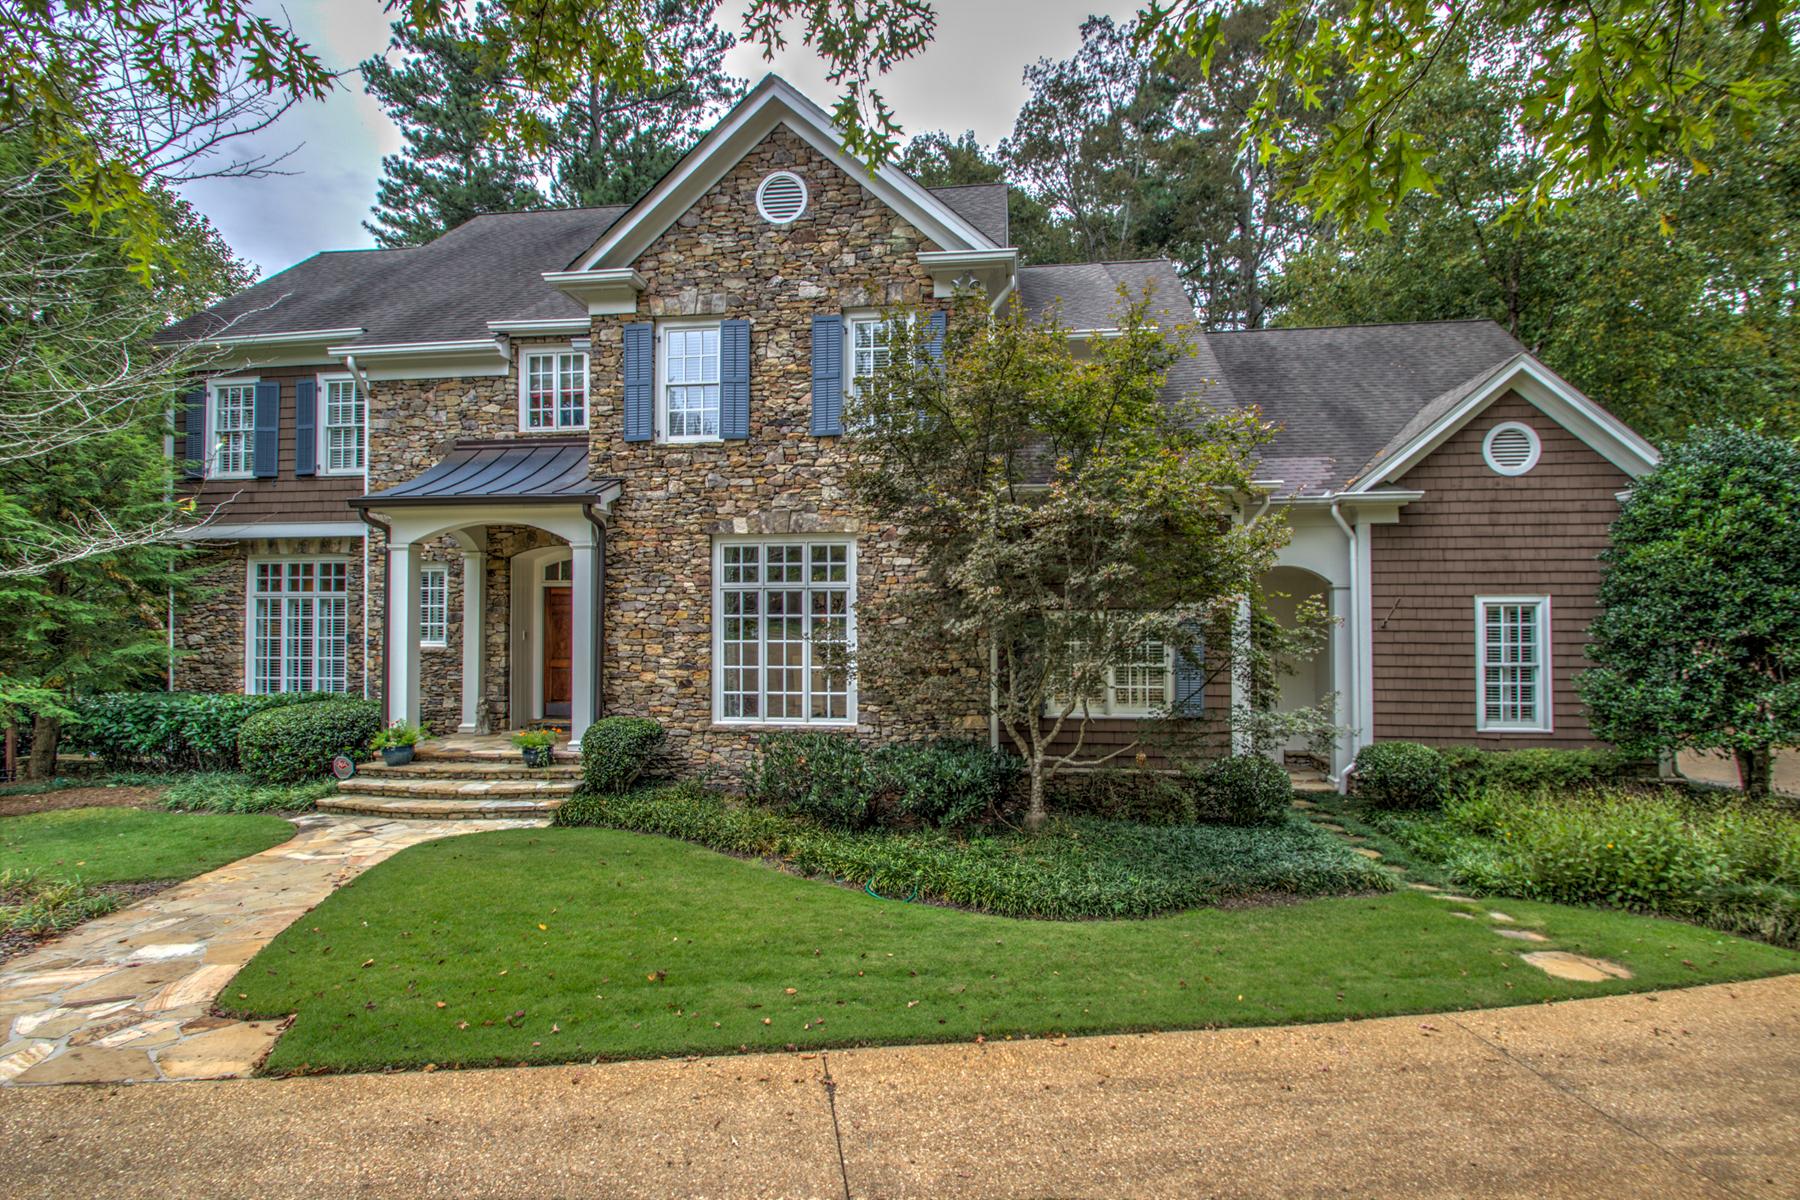 Частный односемейный дом для того Продажа на Located On An Exclusive Private Cul-de-sac Close To Chastain Park 484 Conway Manor Drive NW Chastain Park, Atlanta, Джорджия 30327 Соединенные Штаты